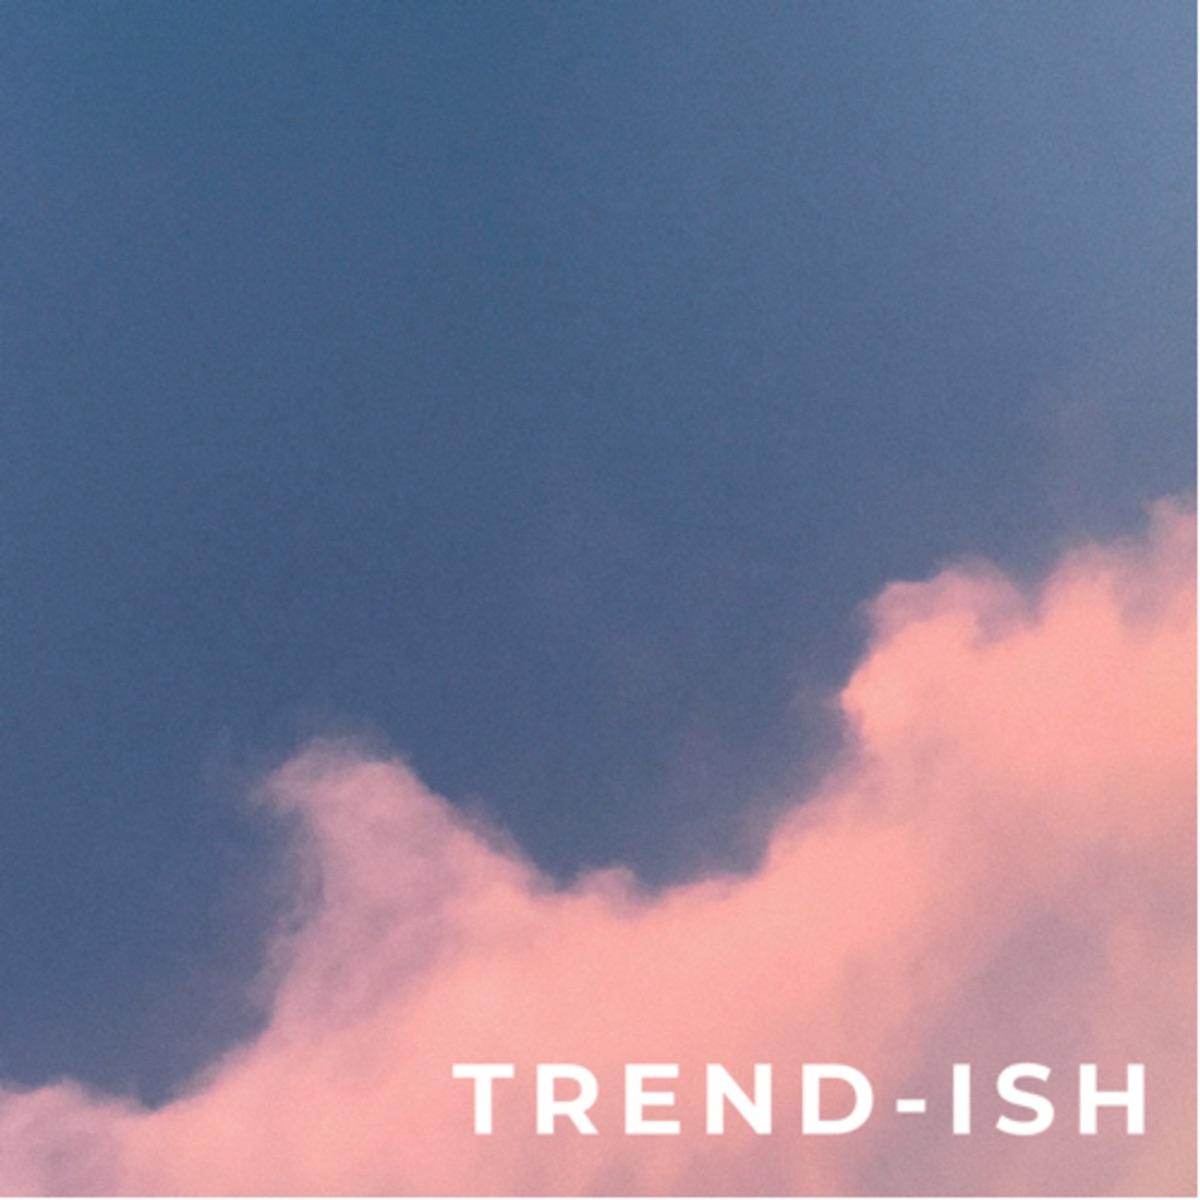 TREND-ISH